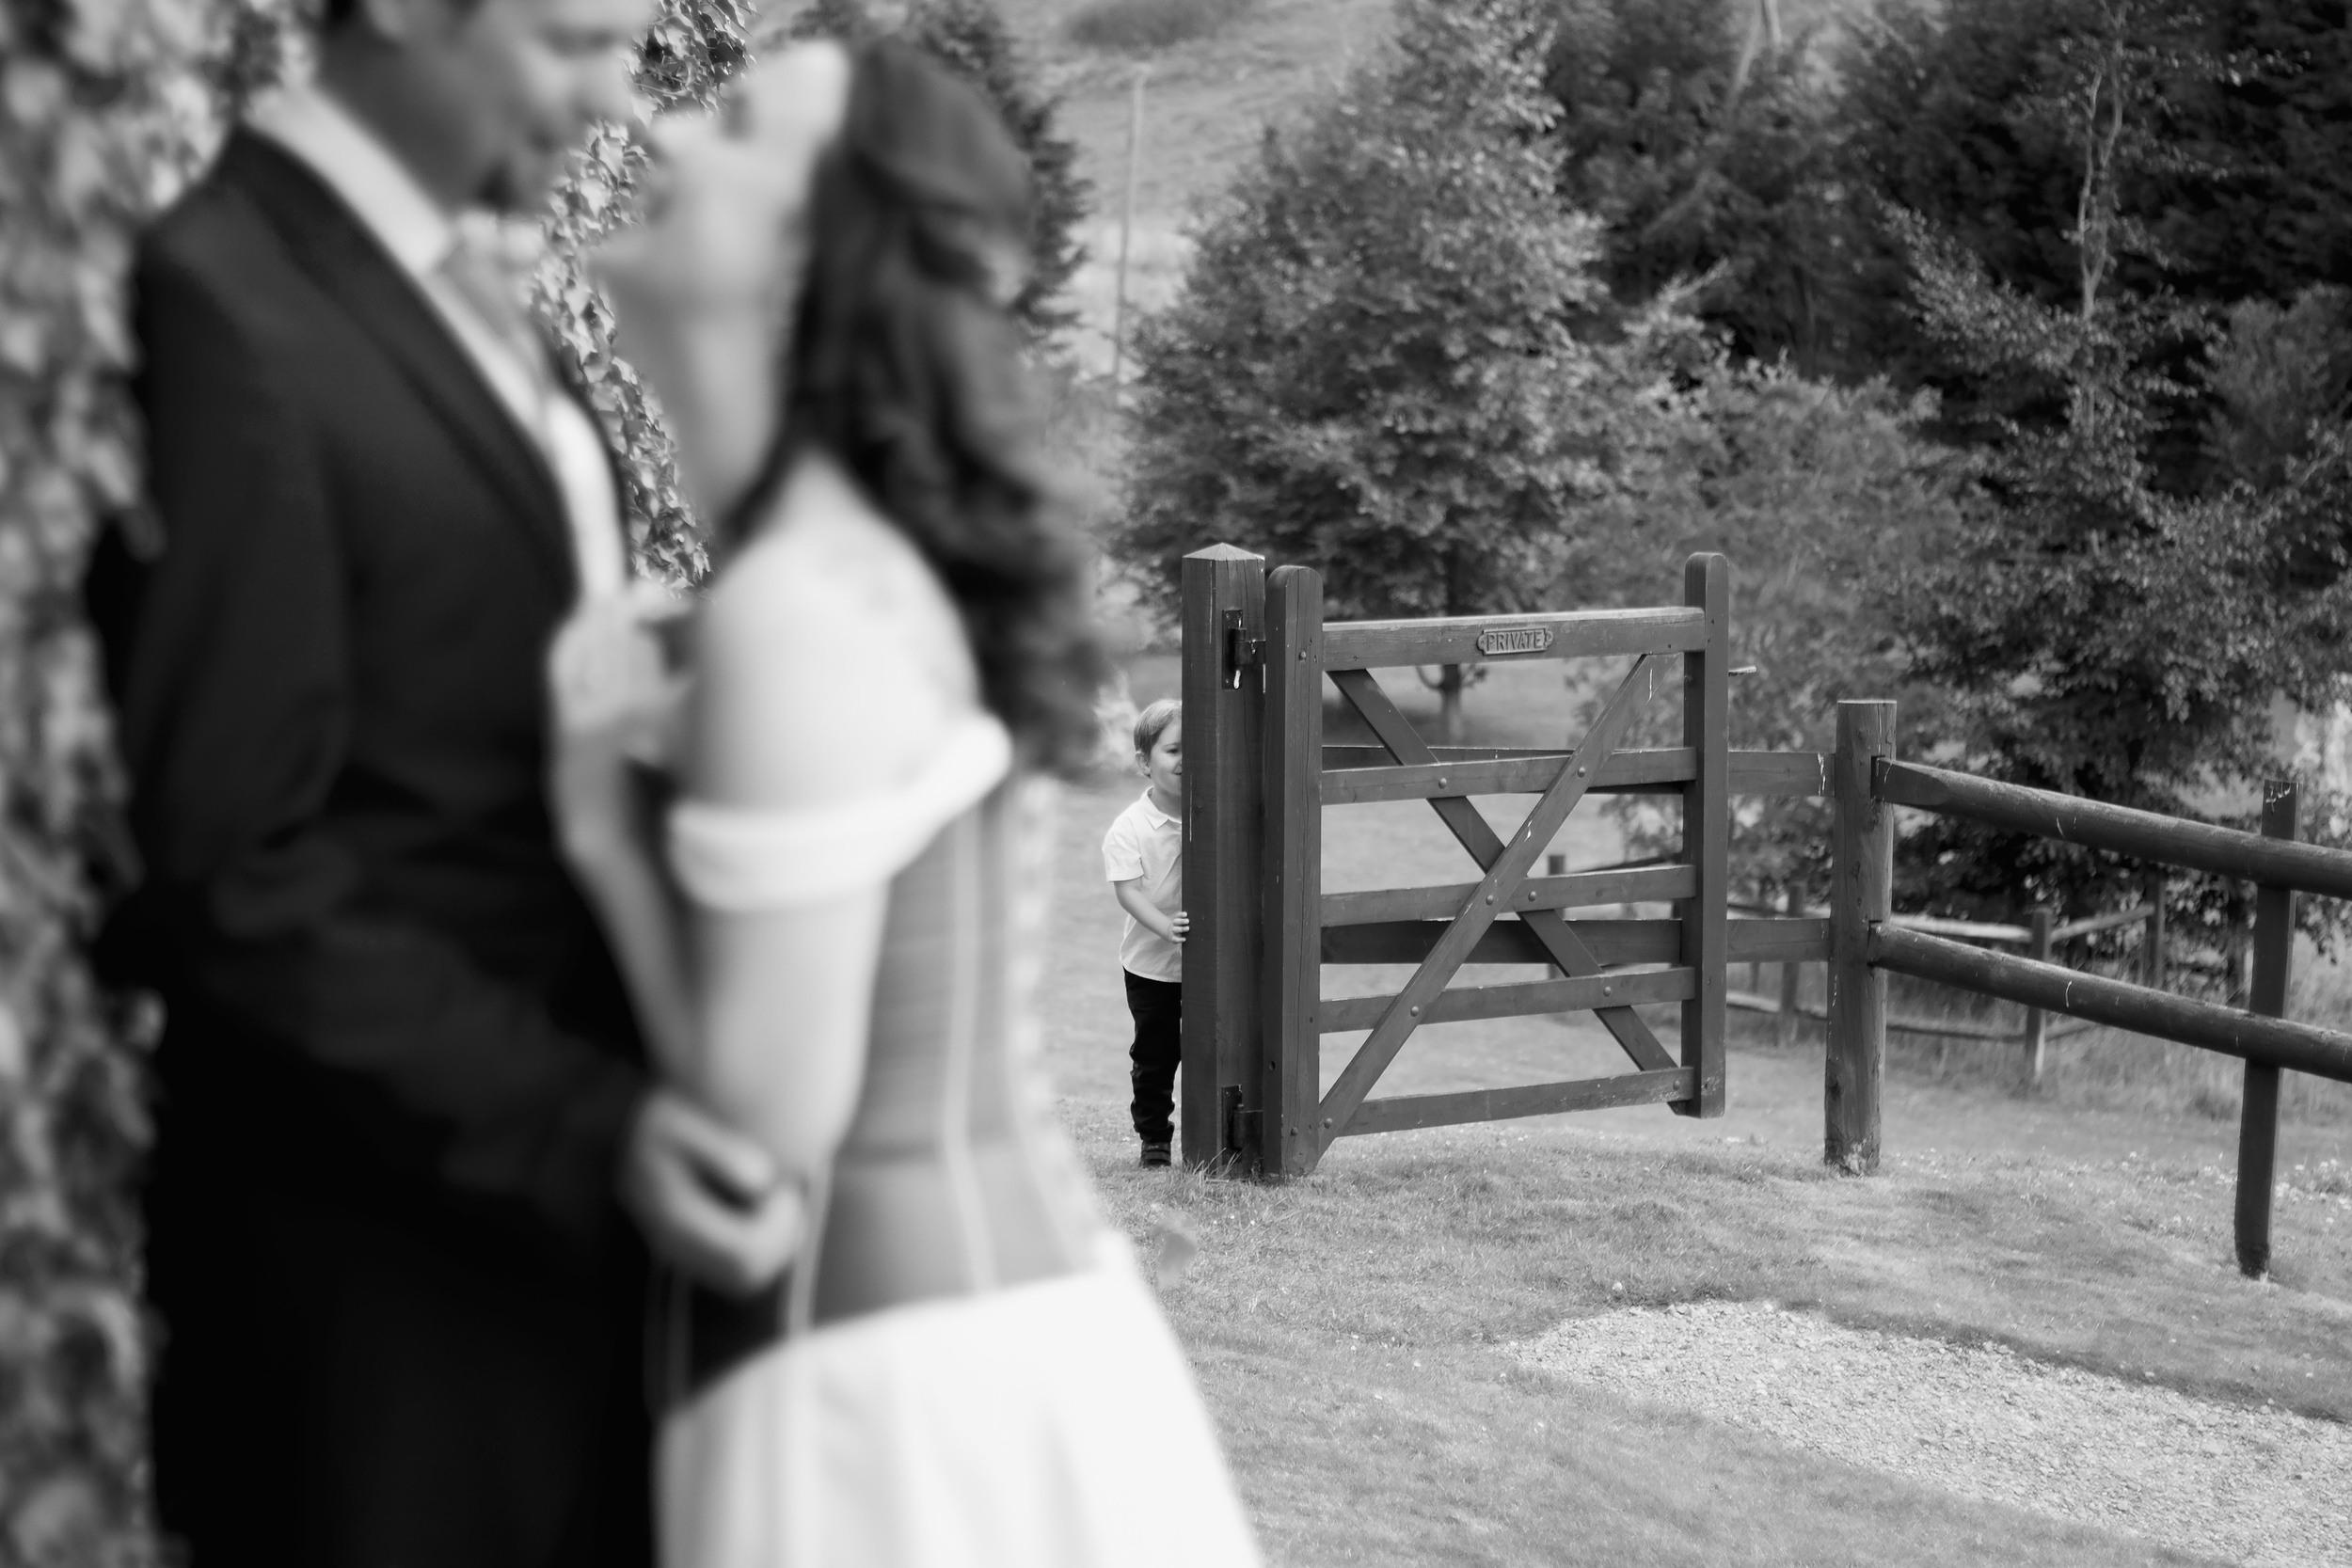 Mr_and_Mrs_Blake_Blog (56 of 74).jpg